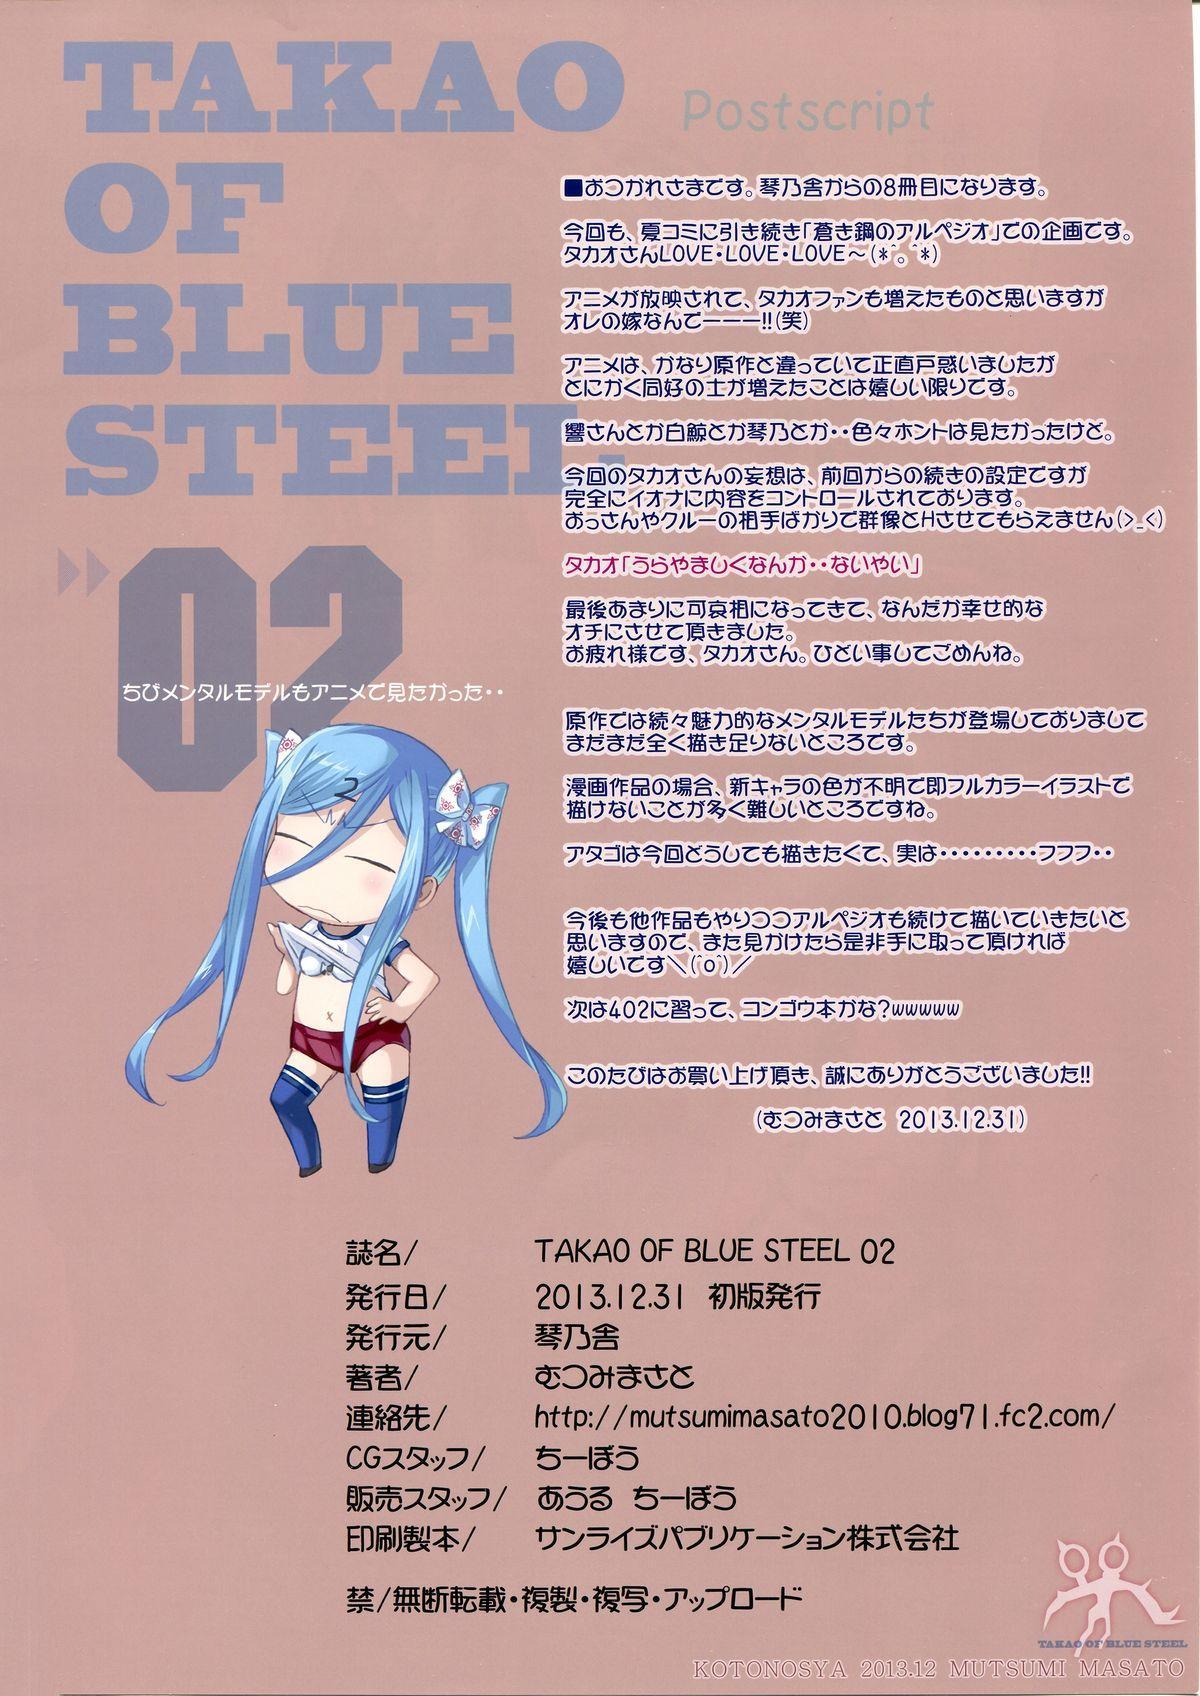 TAKAO OF BLUE STEEL 02 22